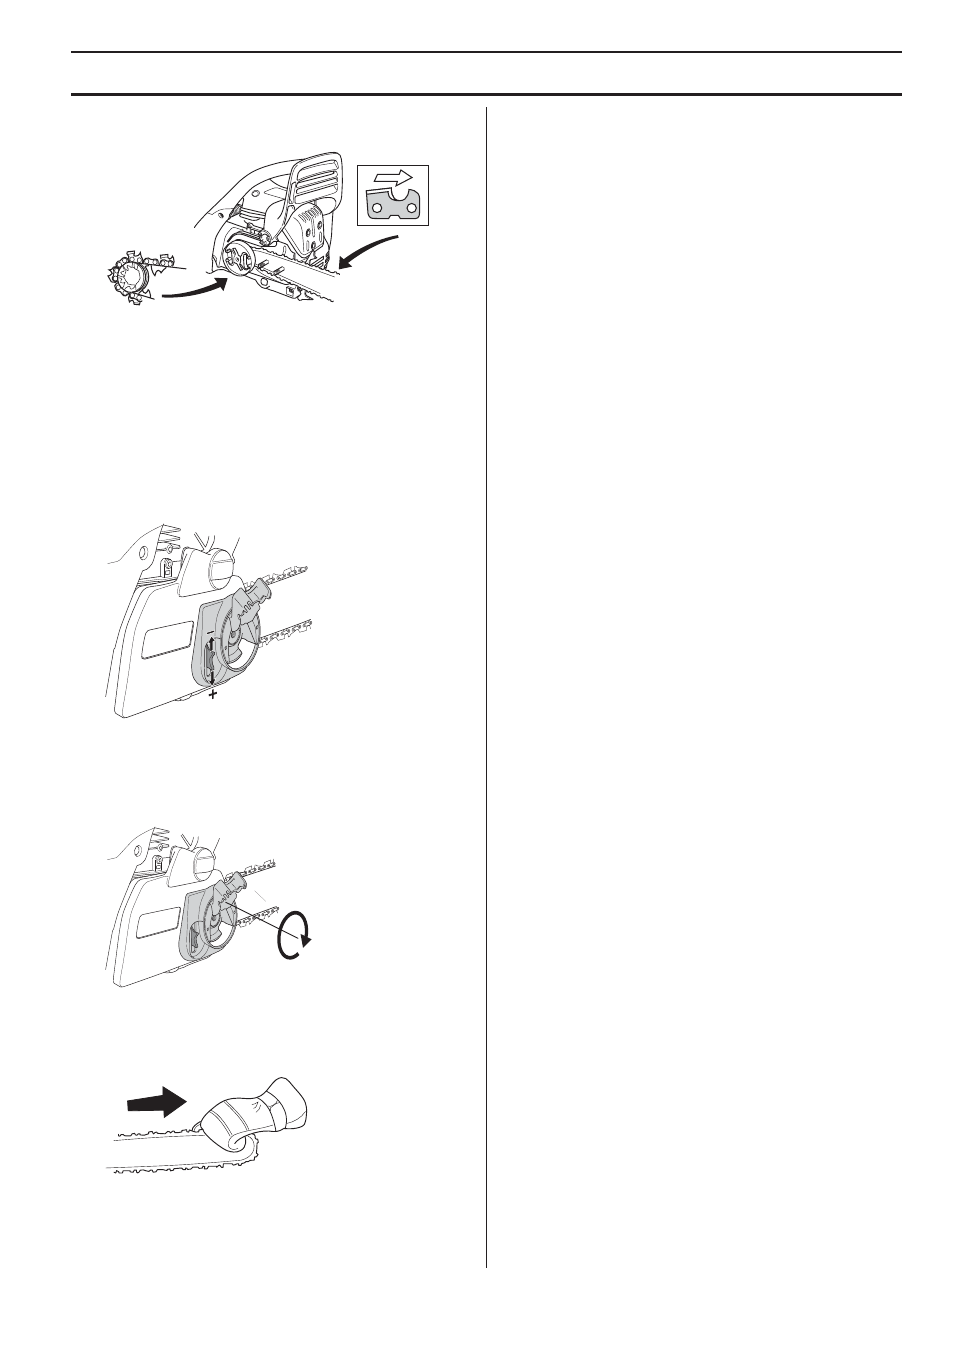 montage | husqvarna 455e rancher user manual | page 63 / 140